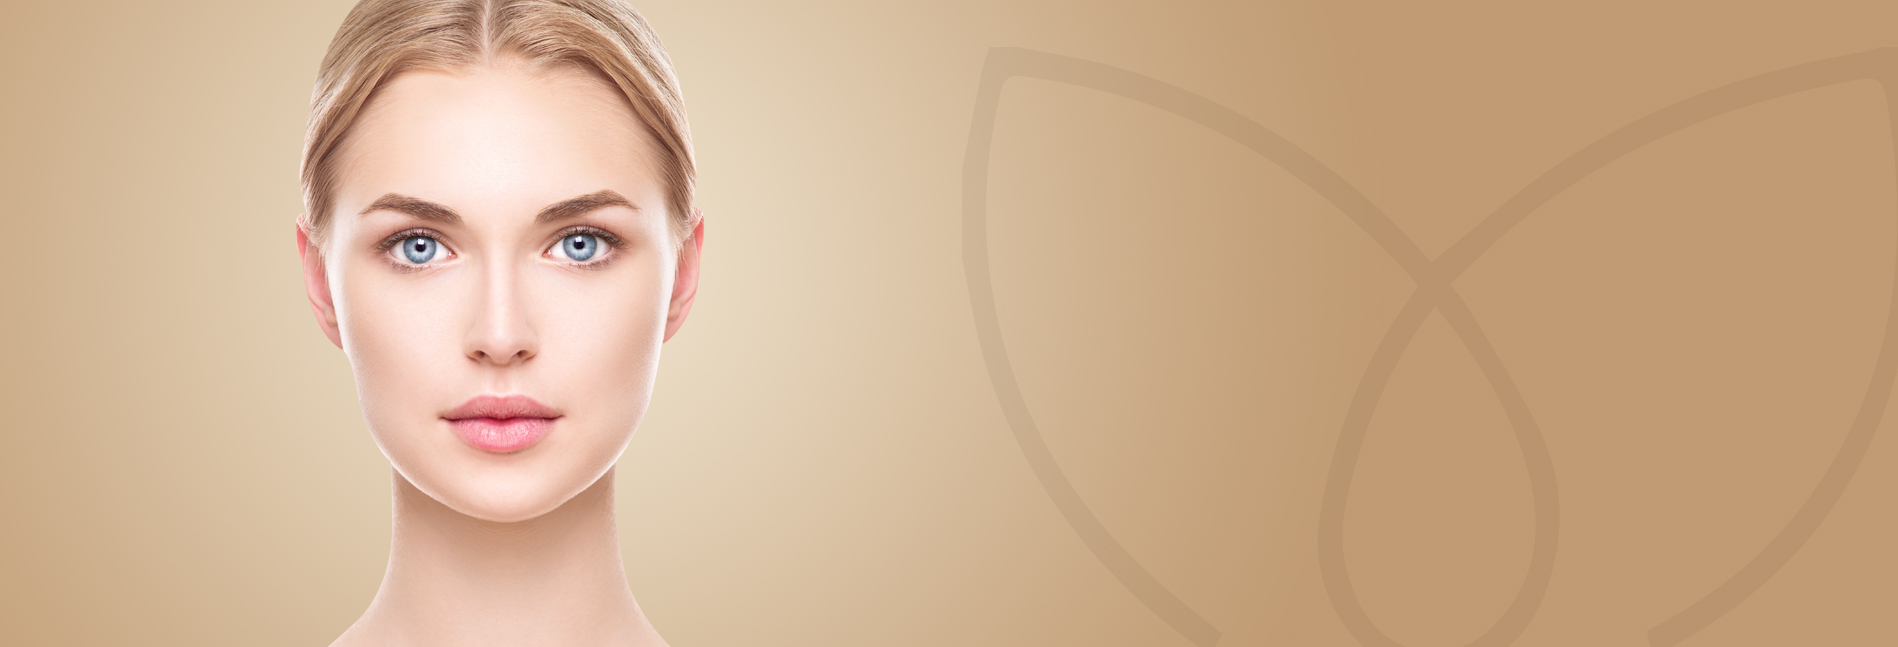 tummy tuck surgery in nashik cosmetic surgery in nashik rhinoplasty / nose job nashik Plastic surgery in nashik